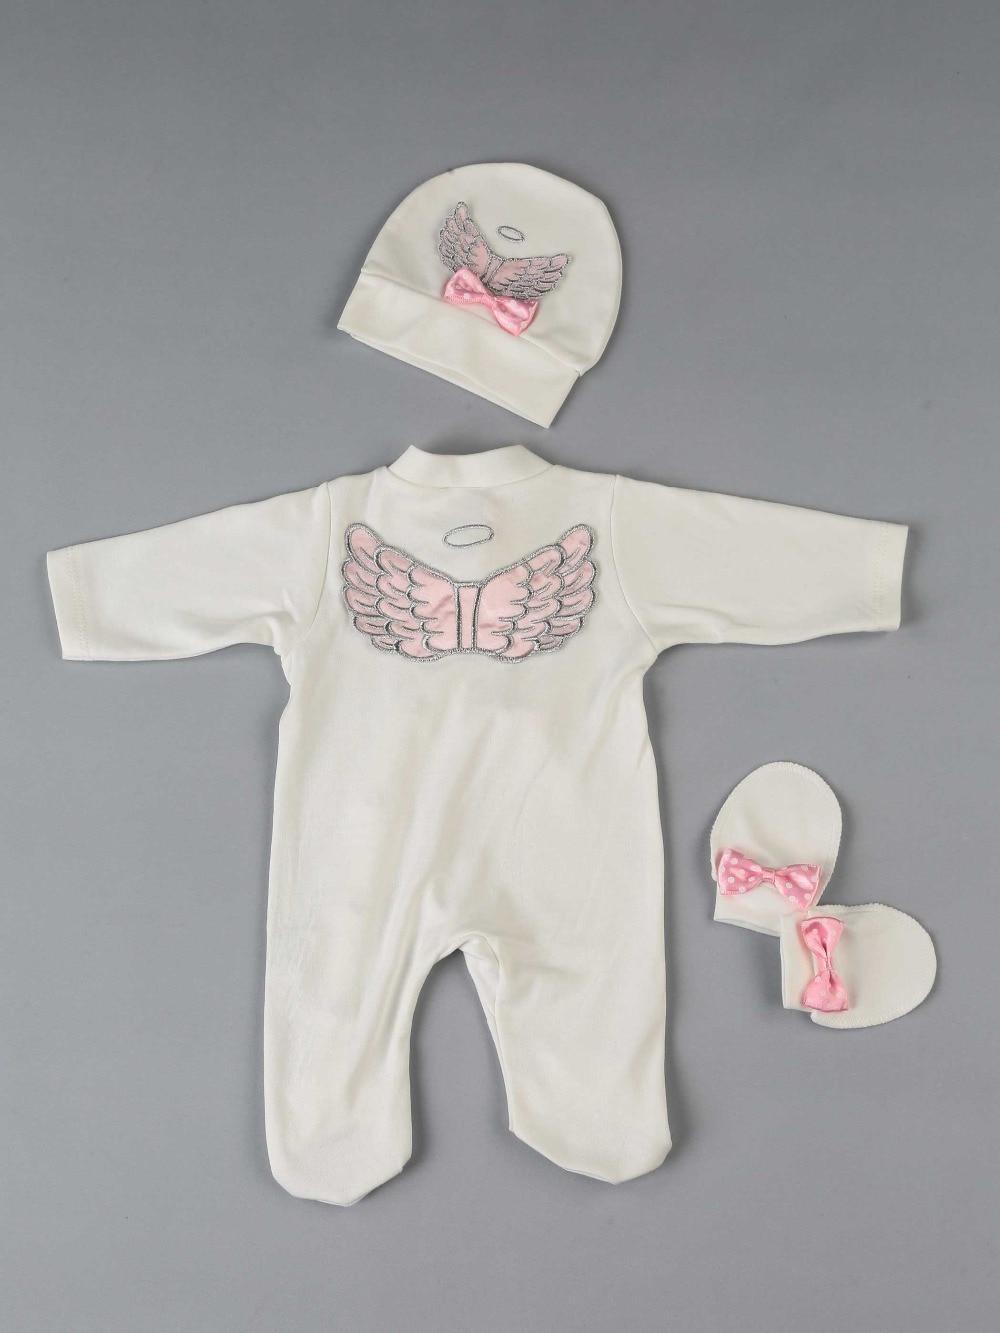 083-584-021 Pembe Melek Kanatlı Kız Bebek 3 lü Tulum Seti (4)